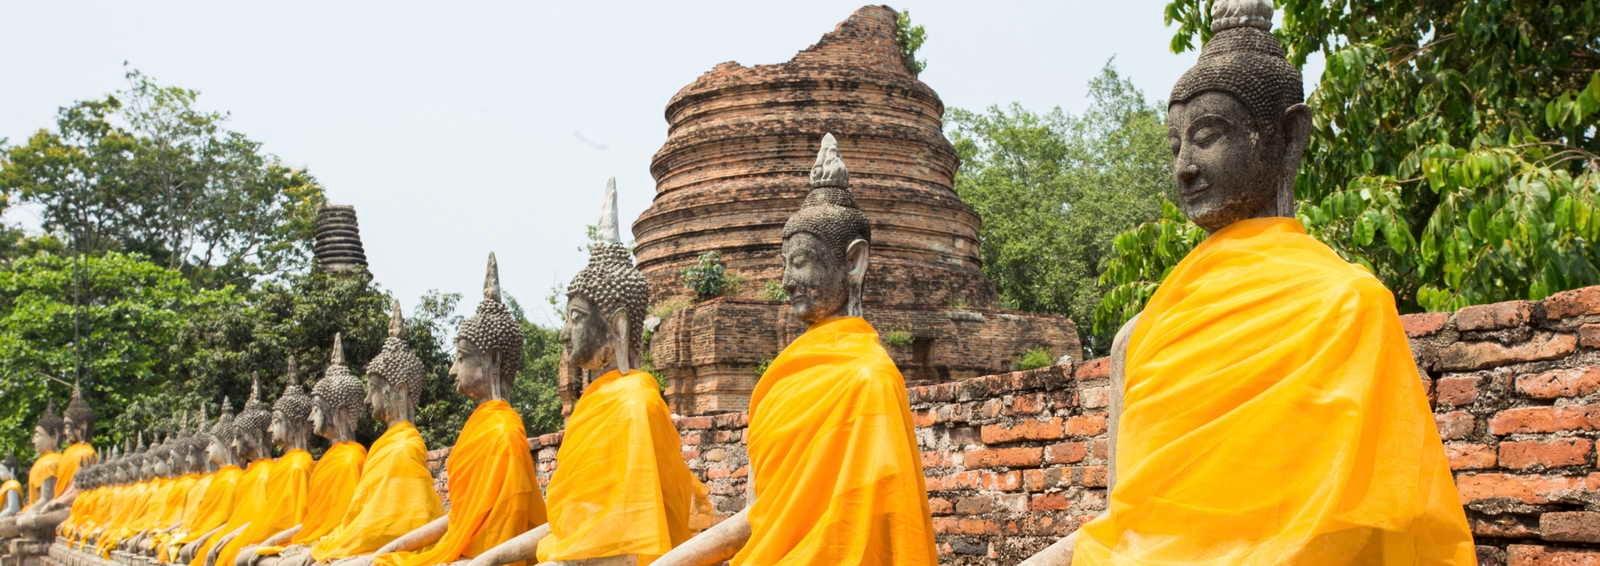 Row of Sacred Buddhas, Angkor complex, Cambodia